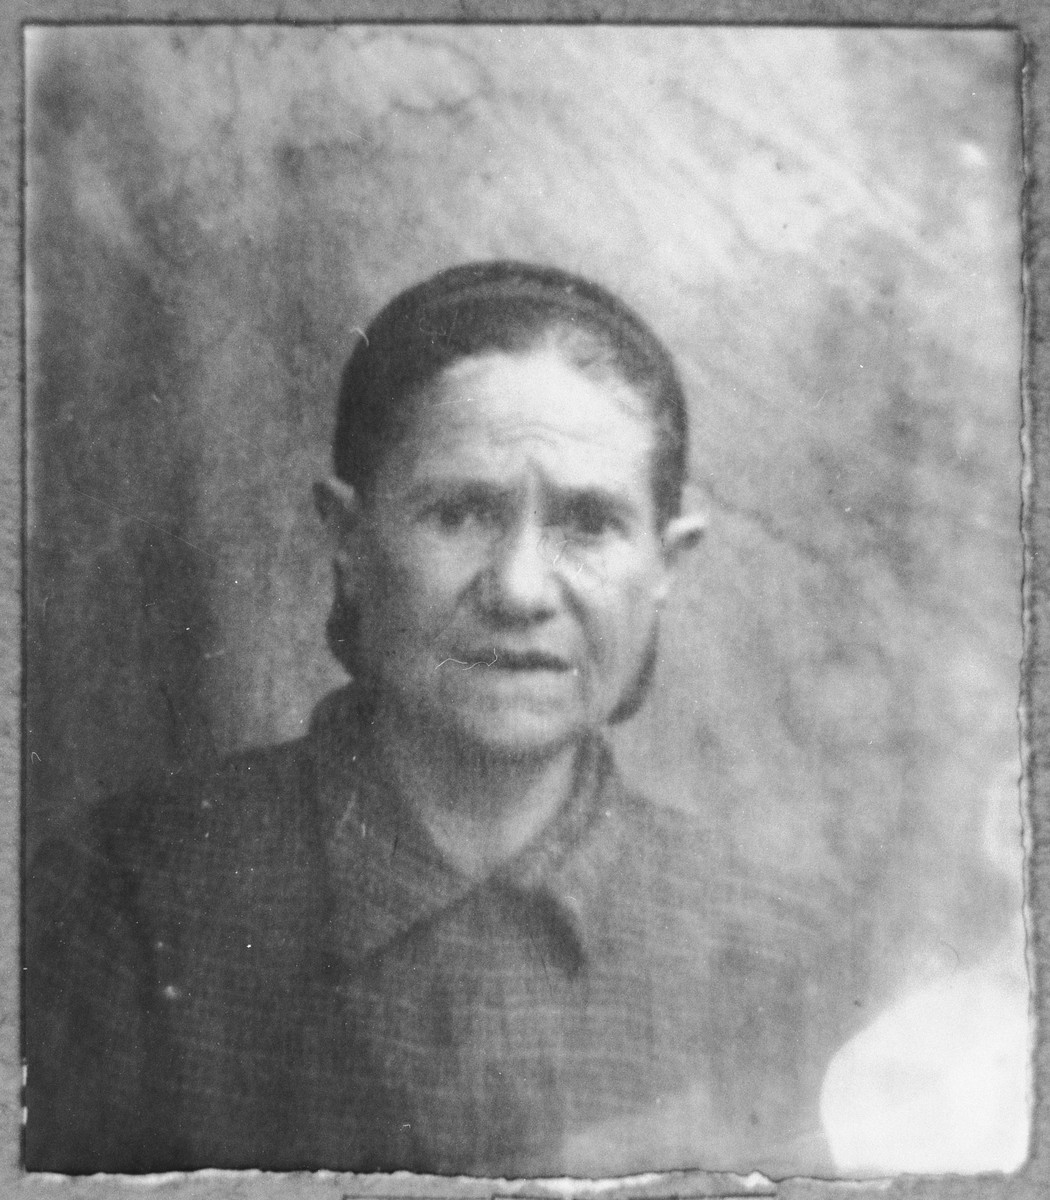 Portrait of Sara Mishulam, wife of Bohor Mishulam.  She lived at Gostivarska 13 in Bitola.